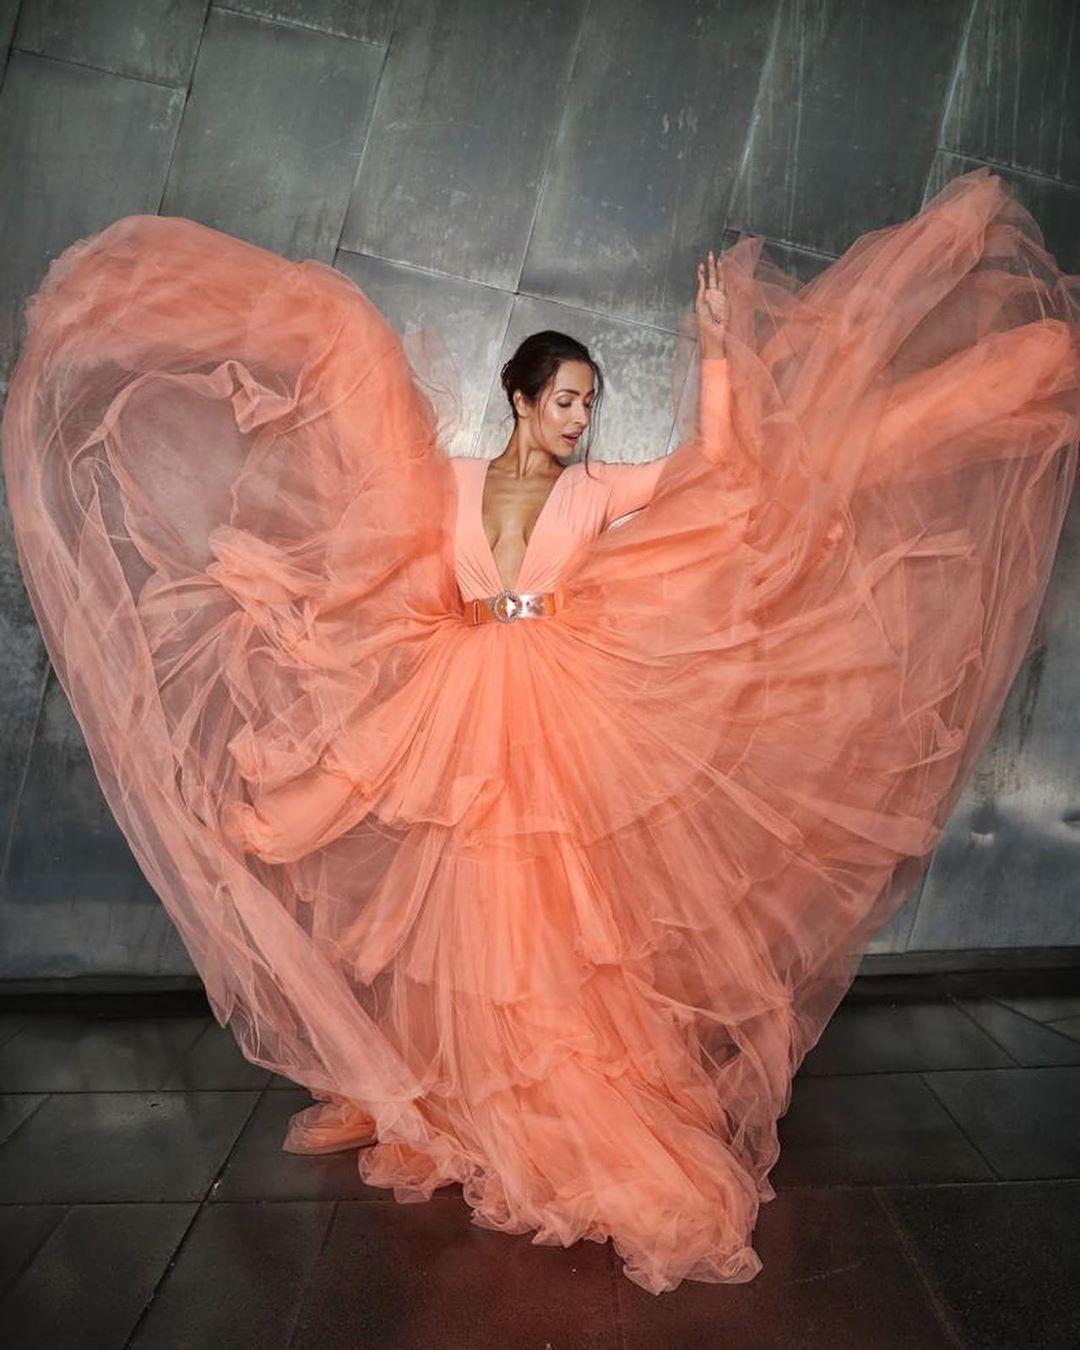 Bollywood Tadka,मलाइका अरोड़ा इमेज,मलाइका अरोड़ा फोटो,मलाइका अरोड़ा पिक्चर